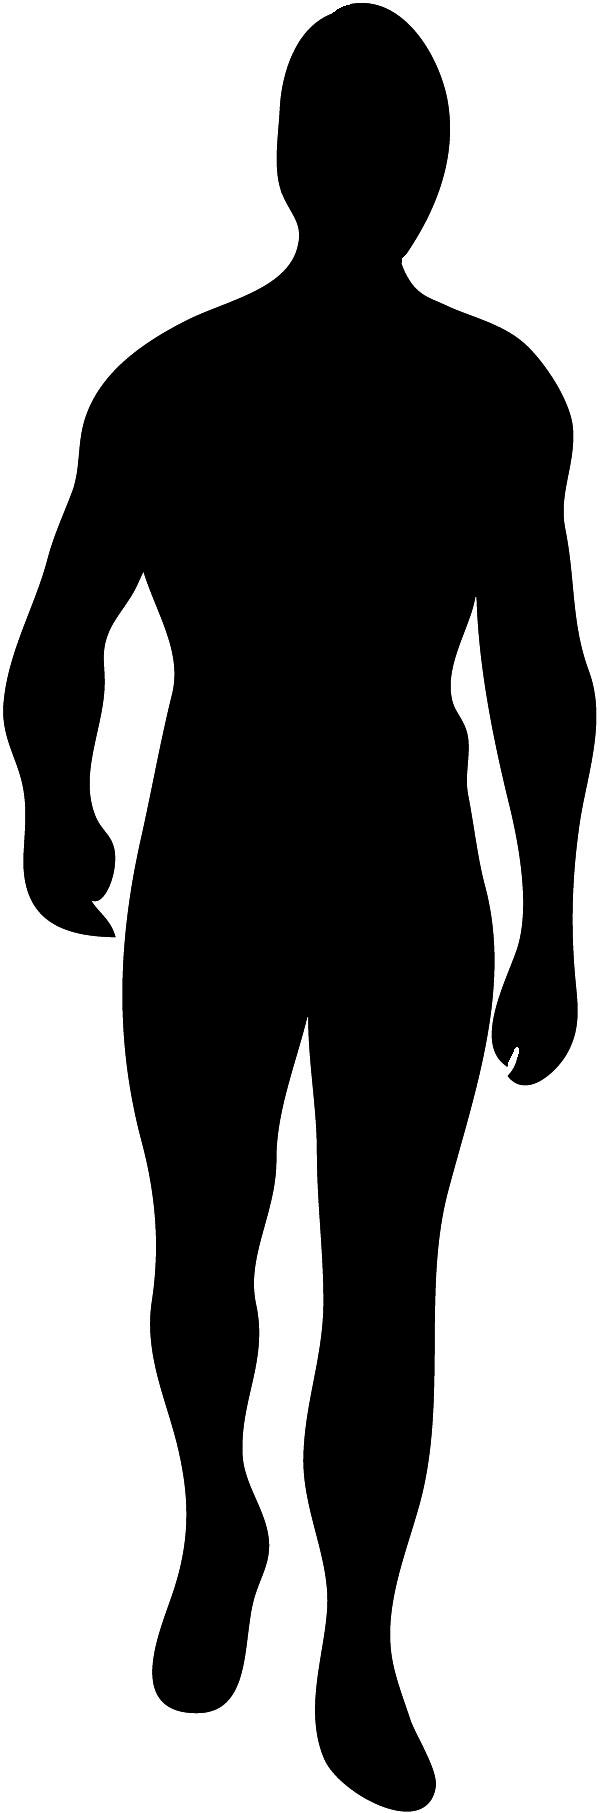 600x1813 Body Silhouettes